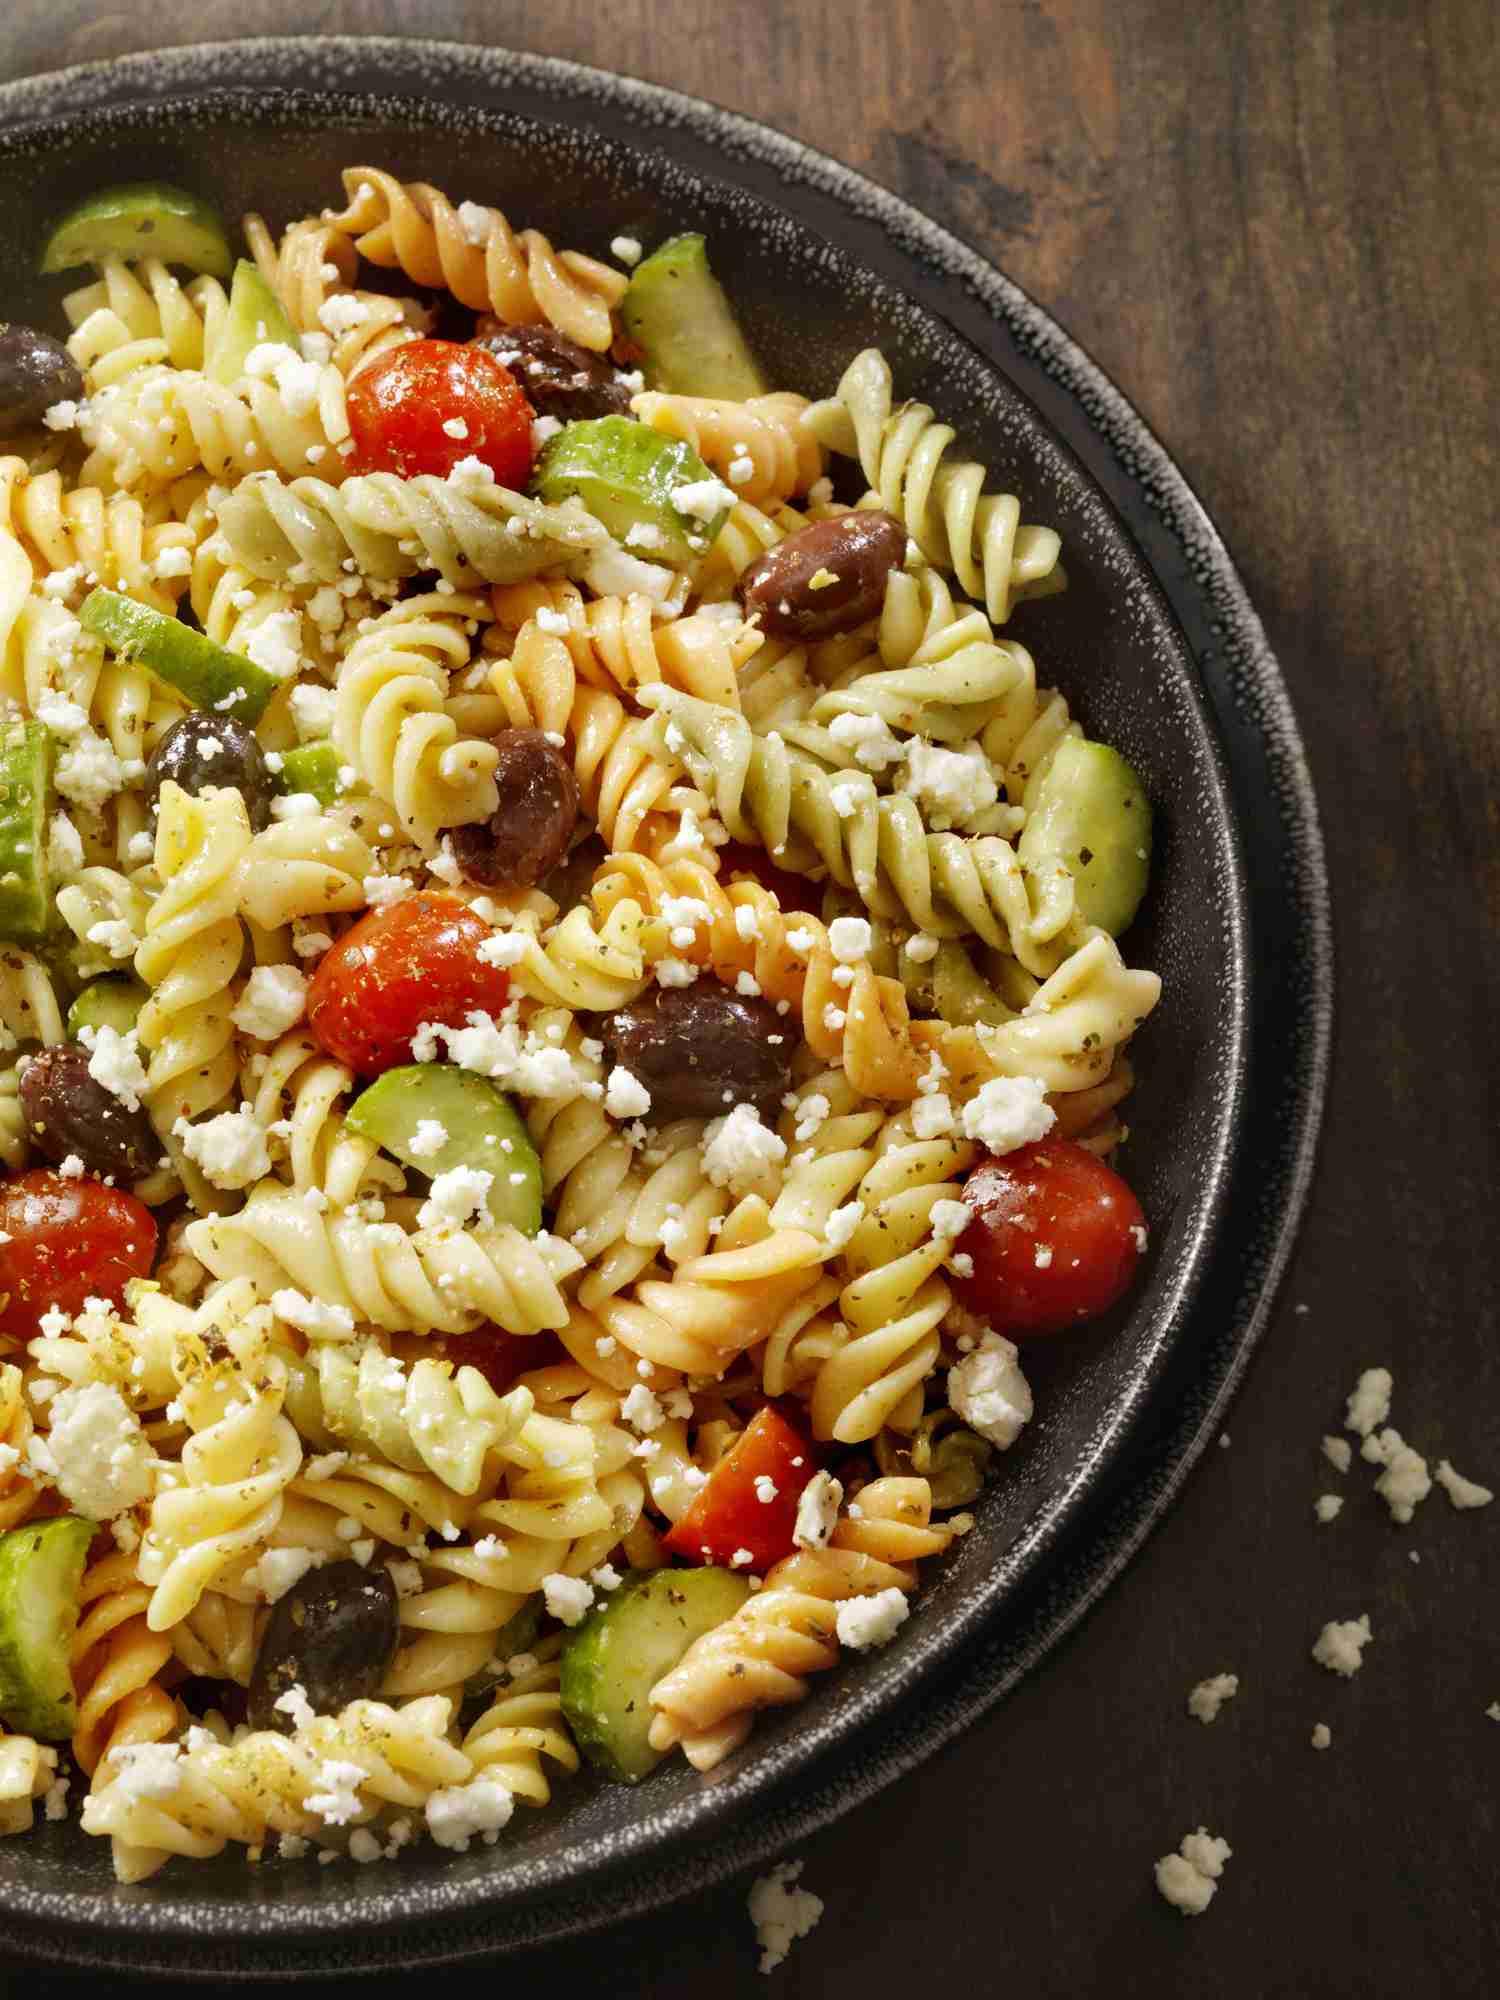 Vegetarian Olive and Feta Pasta Recipe